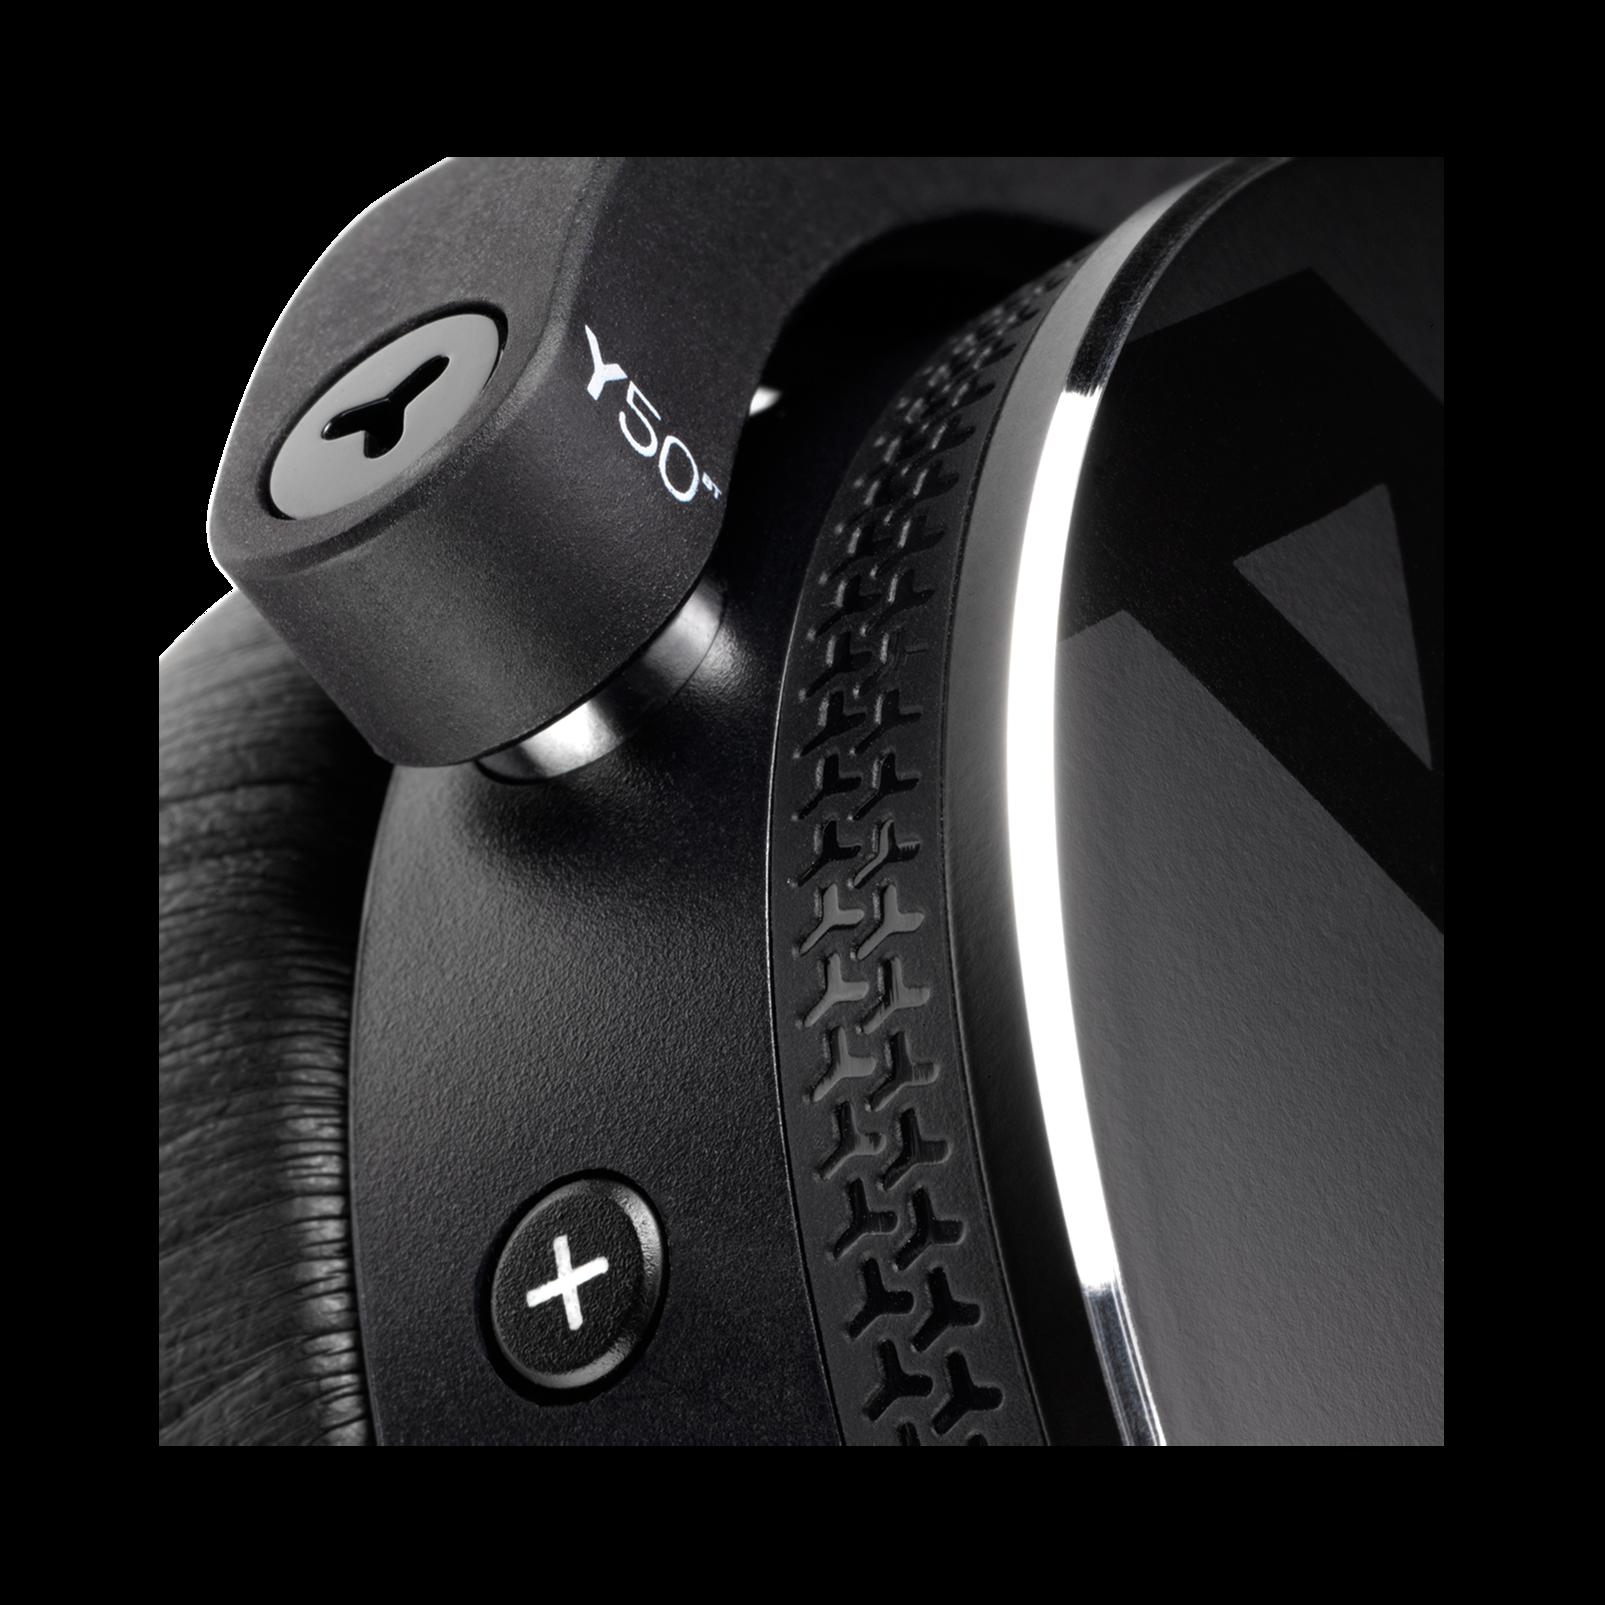 Y50BT - Black - Premium portable Bluetooth speaker with quad microphone conferencing system - Detailshot 2